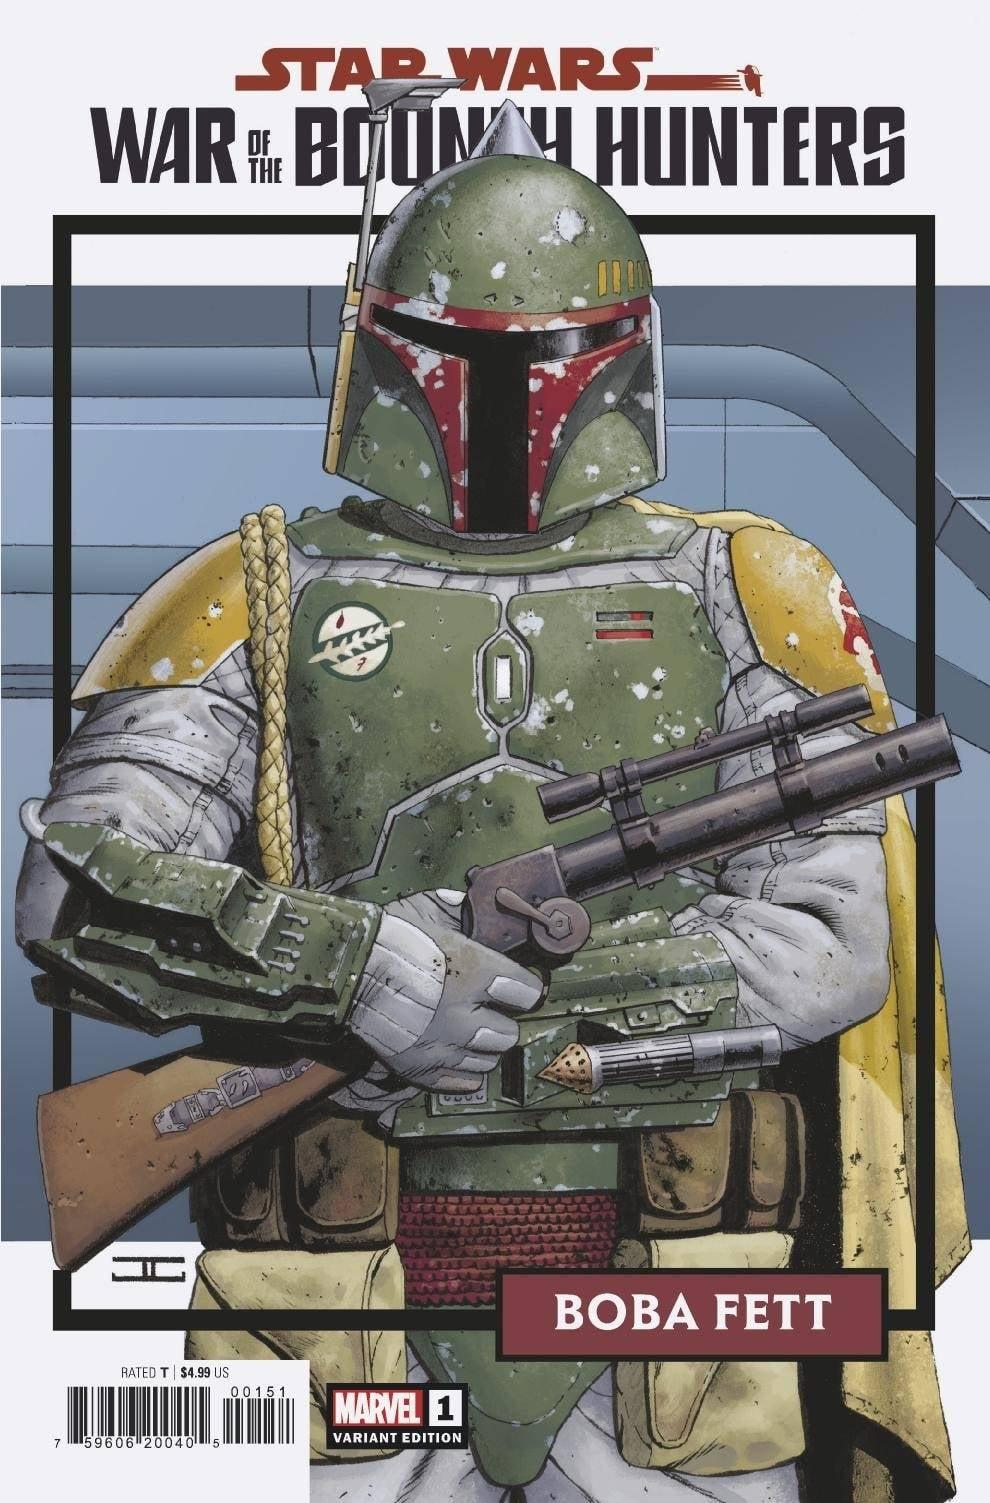 Star Wars: War of the Bounty Hunters 1 - Trading Card Variant (Cassaday)